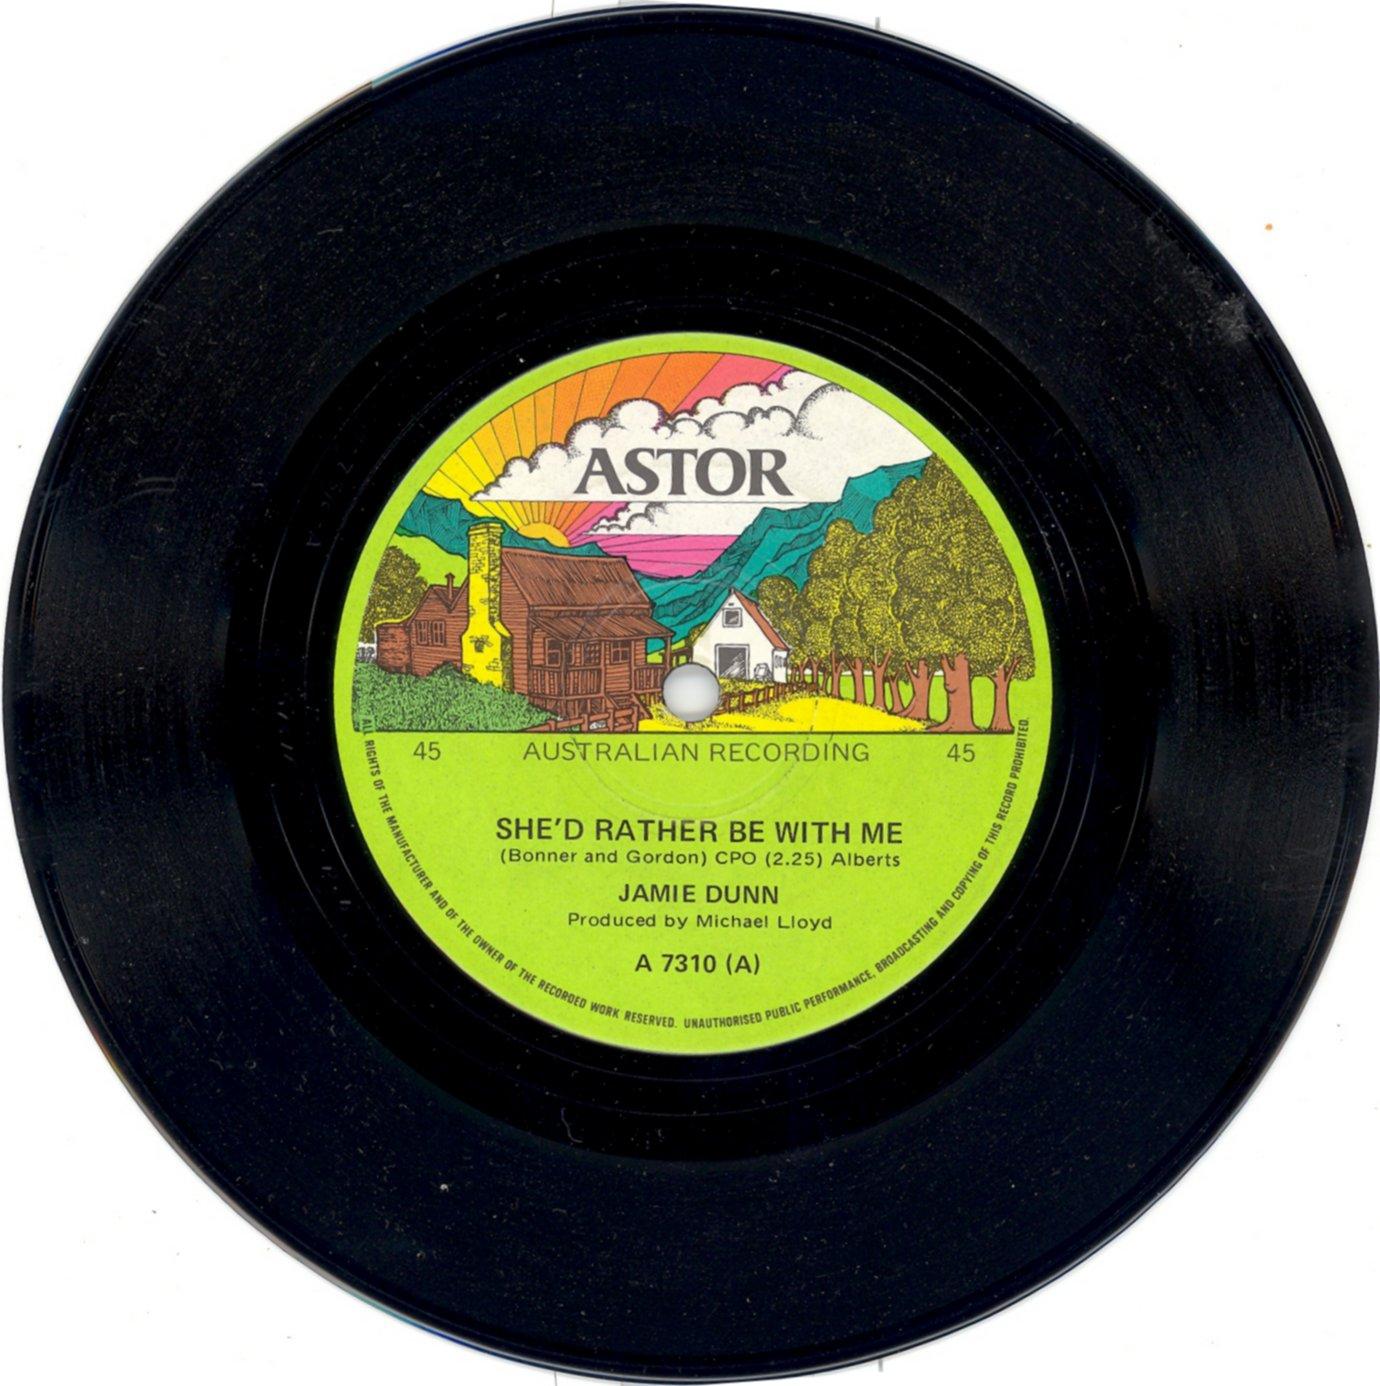 Milesago Record Labels Astor